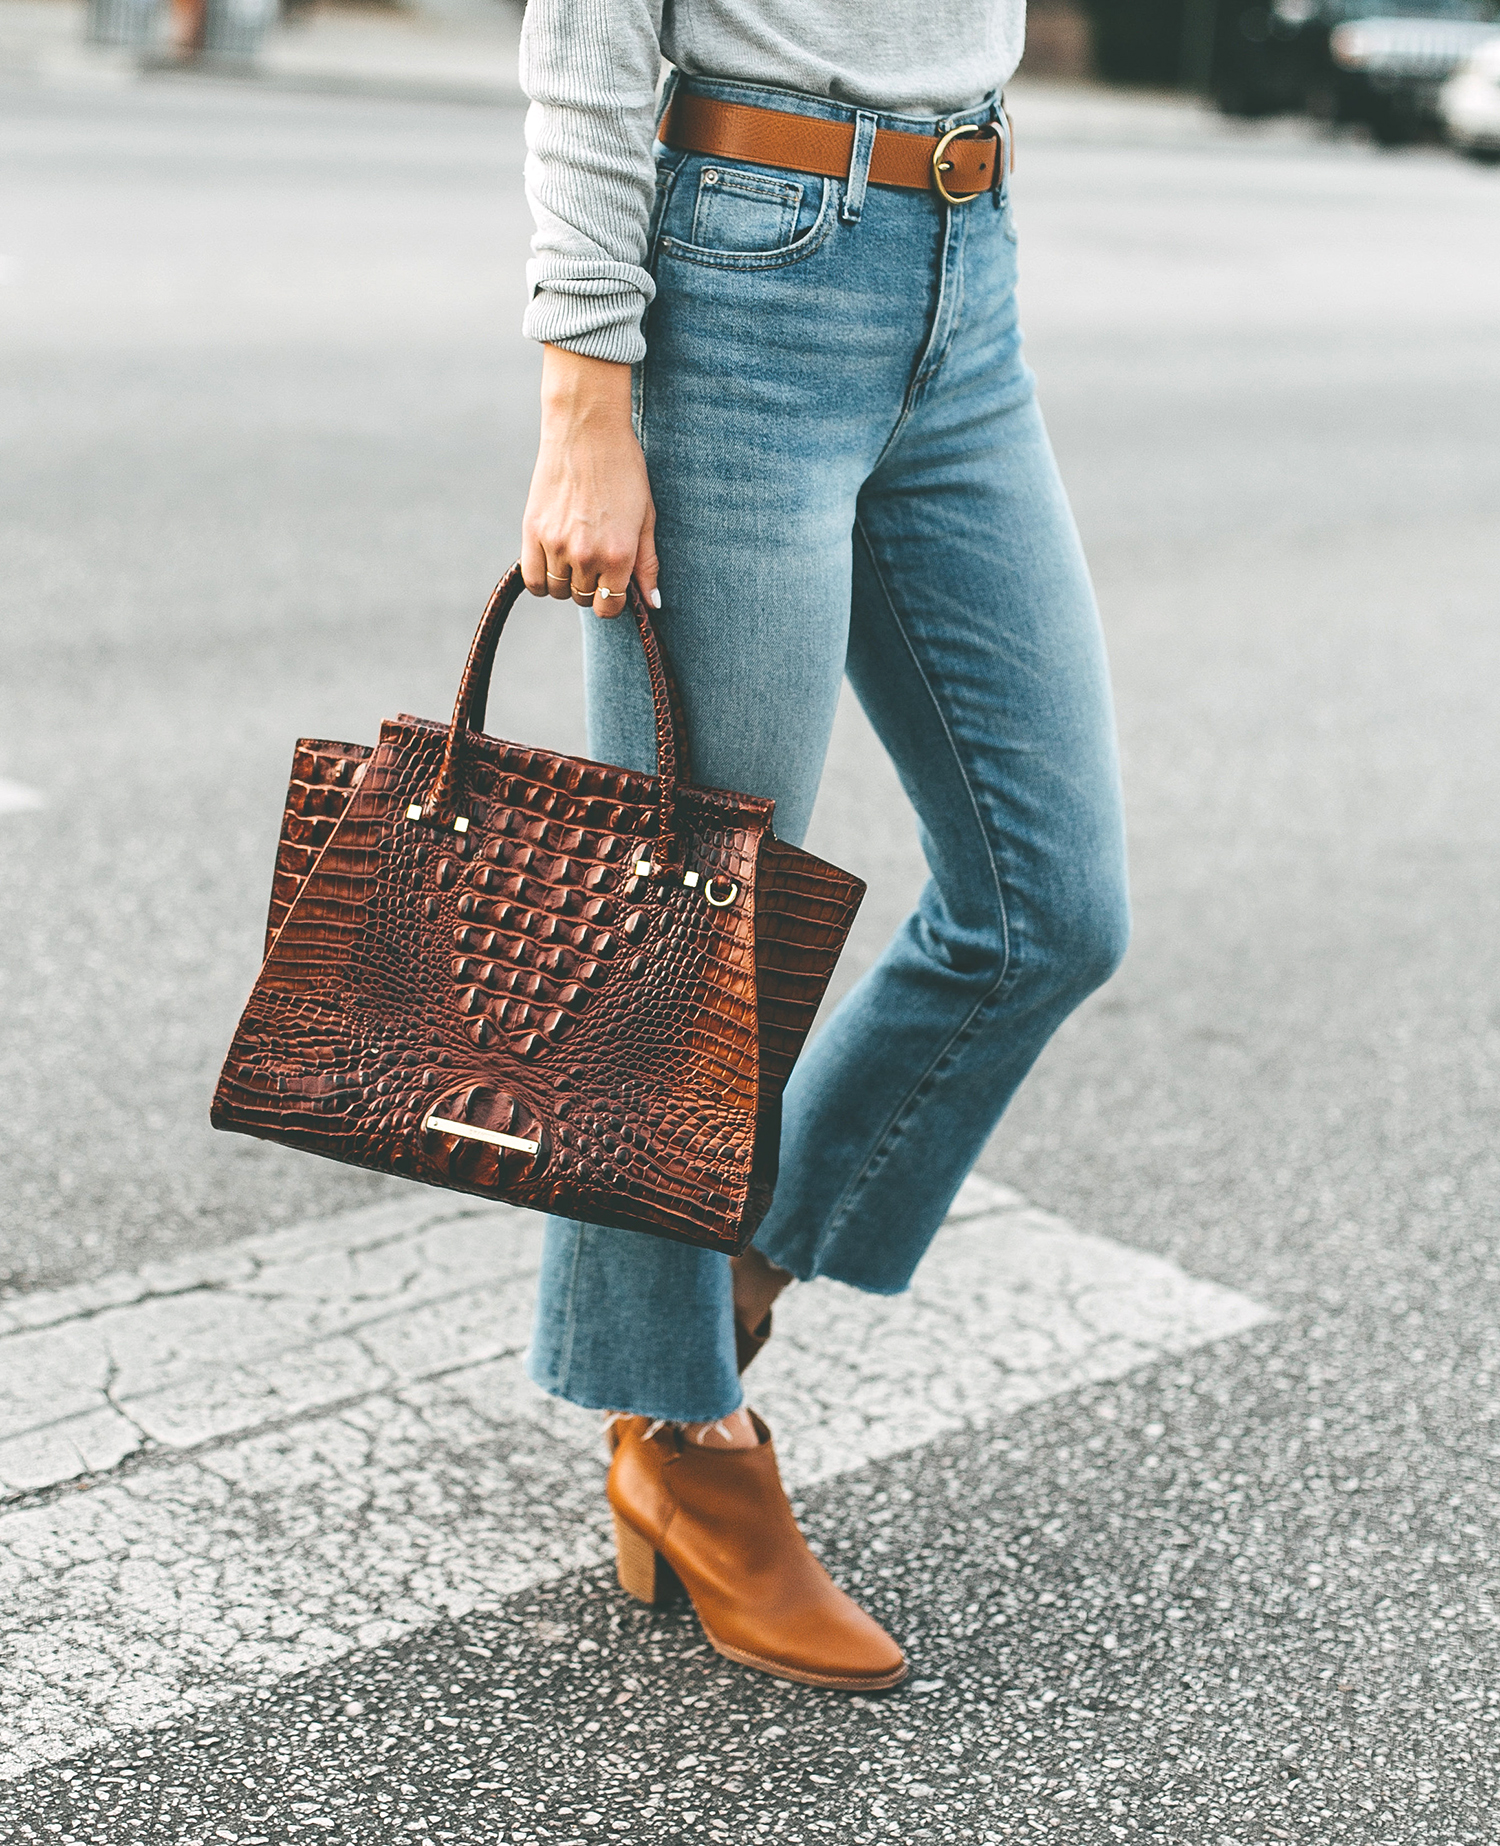 livvyland-blog-olivia-watson-south-congress-avenue-austin-texas-fashion-life-style-blogger-bdg-high-waist-crop-flare-jeans-5